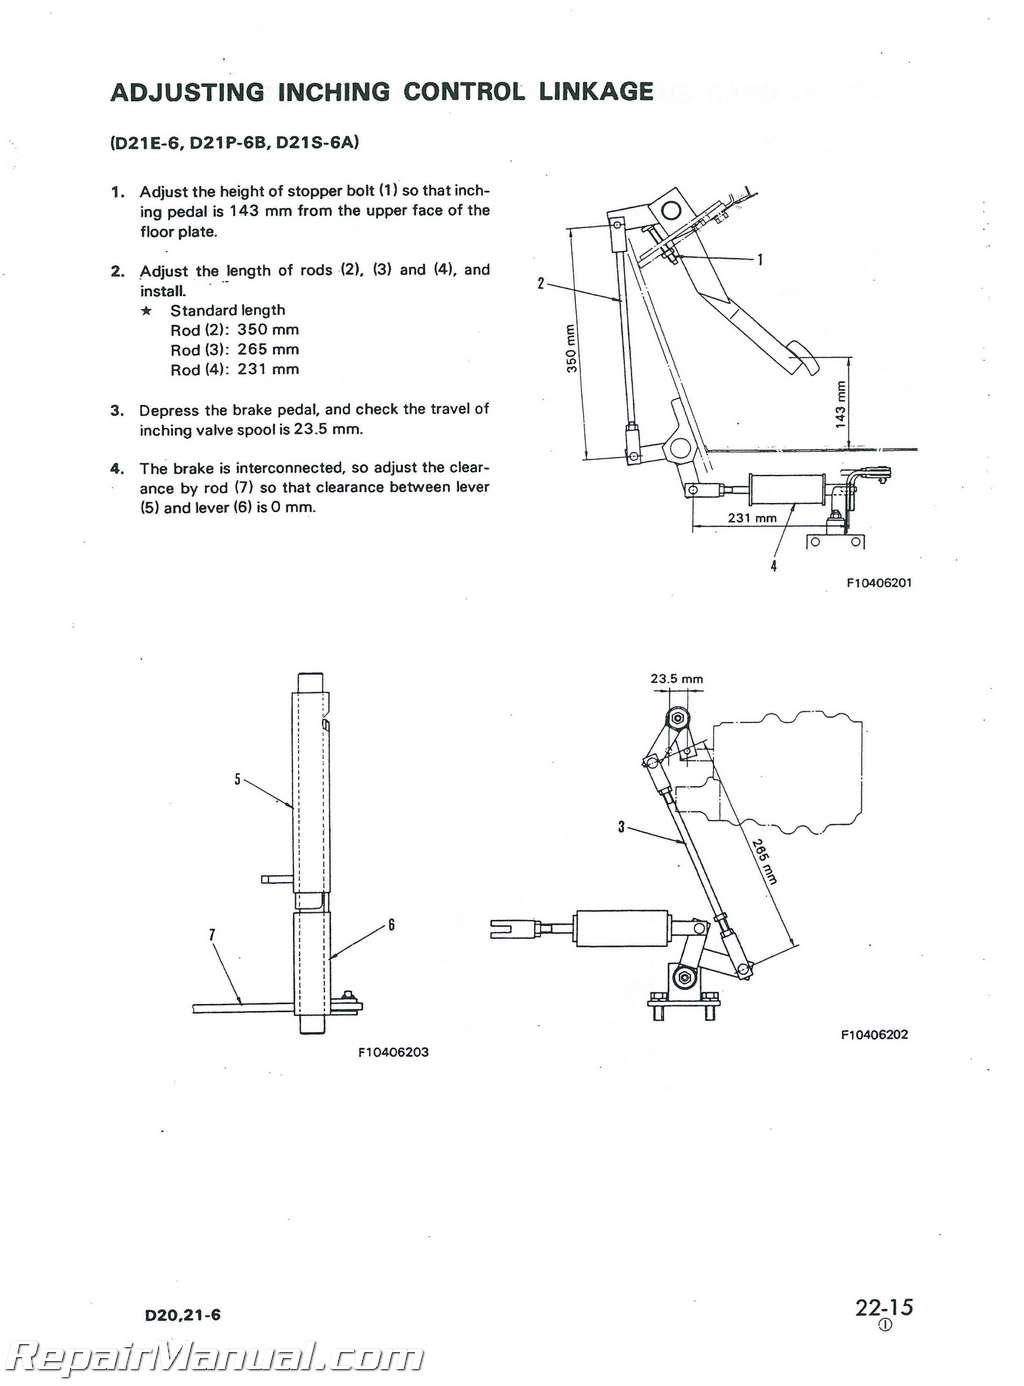 komatsu d20 d21 d31 d37 chassis only service manual repair komatsu d20 d21 d31 d37 chassis only service manual 003